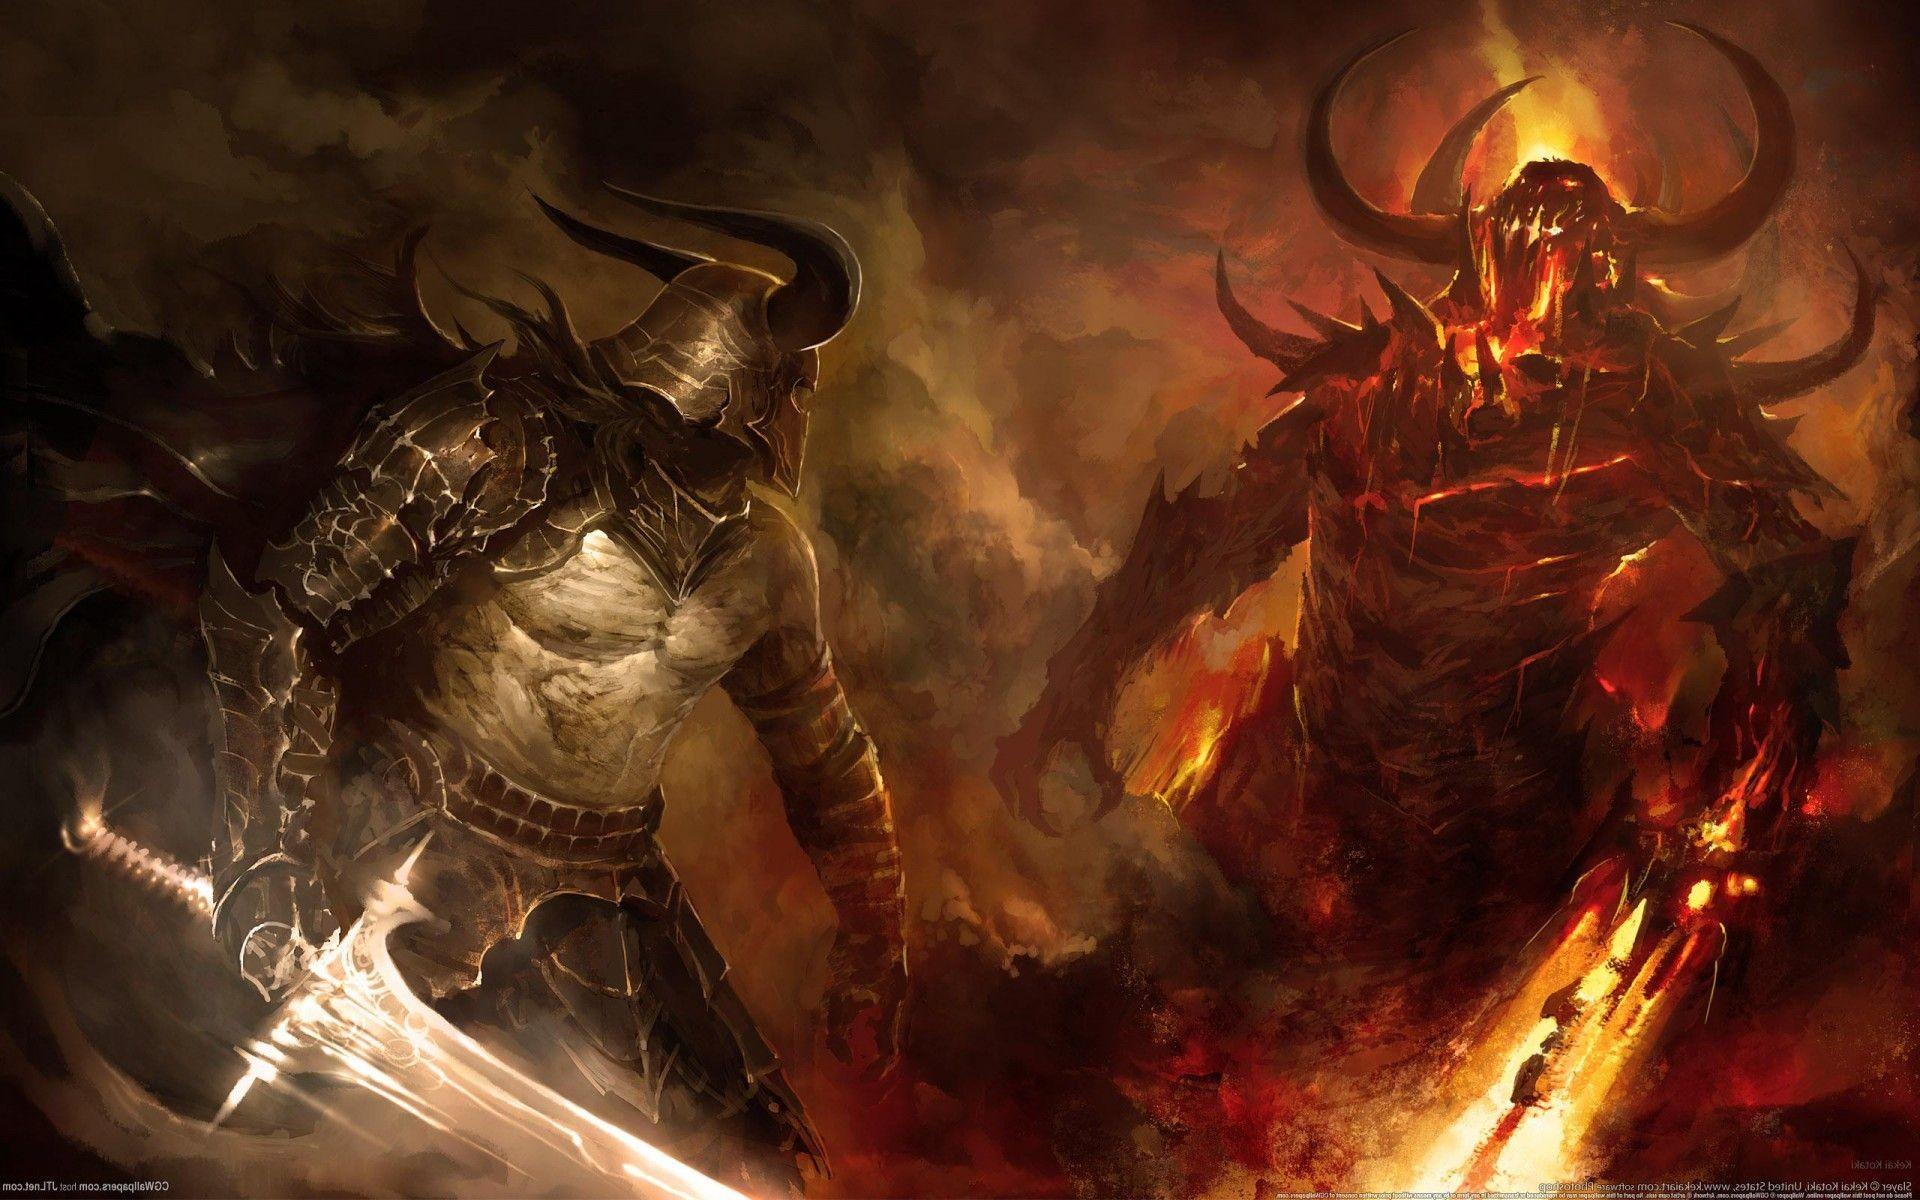 Res: 1920x1200, epic-battle-btw-2-warriors-318942.jpg (1920×